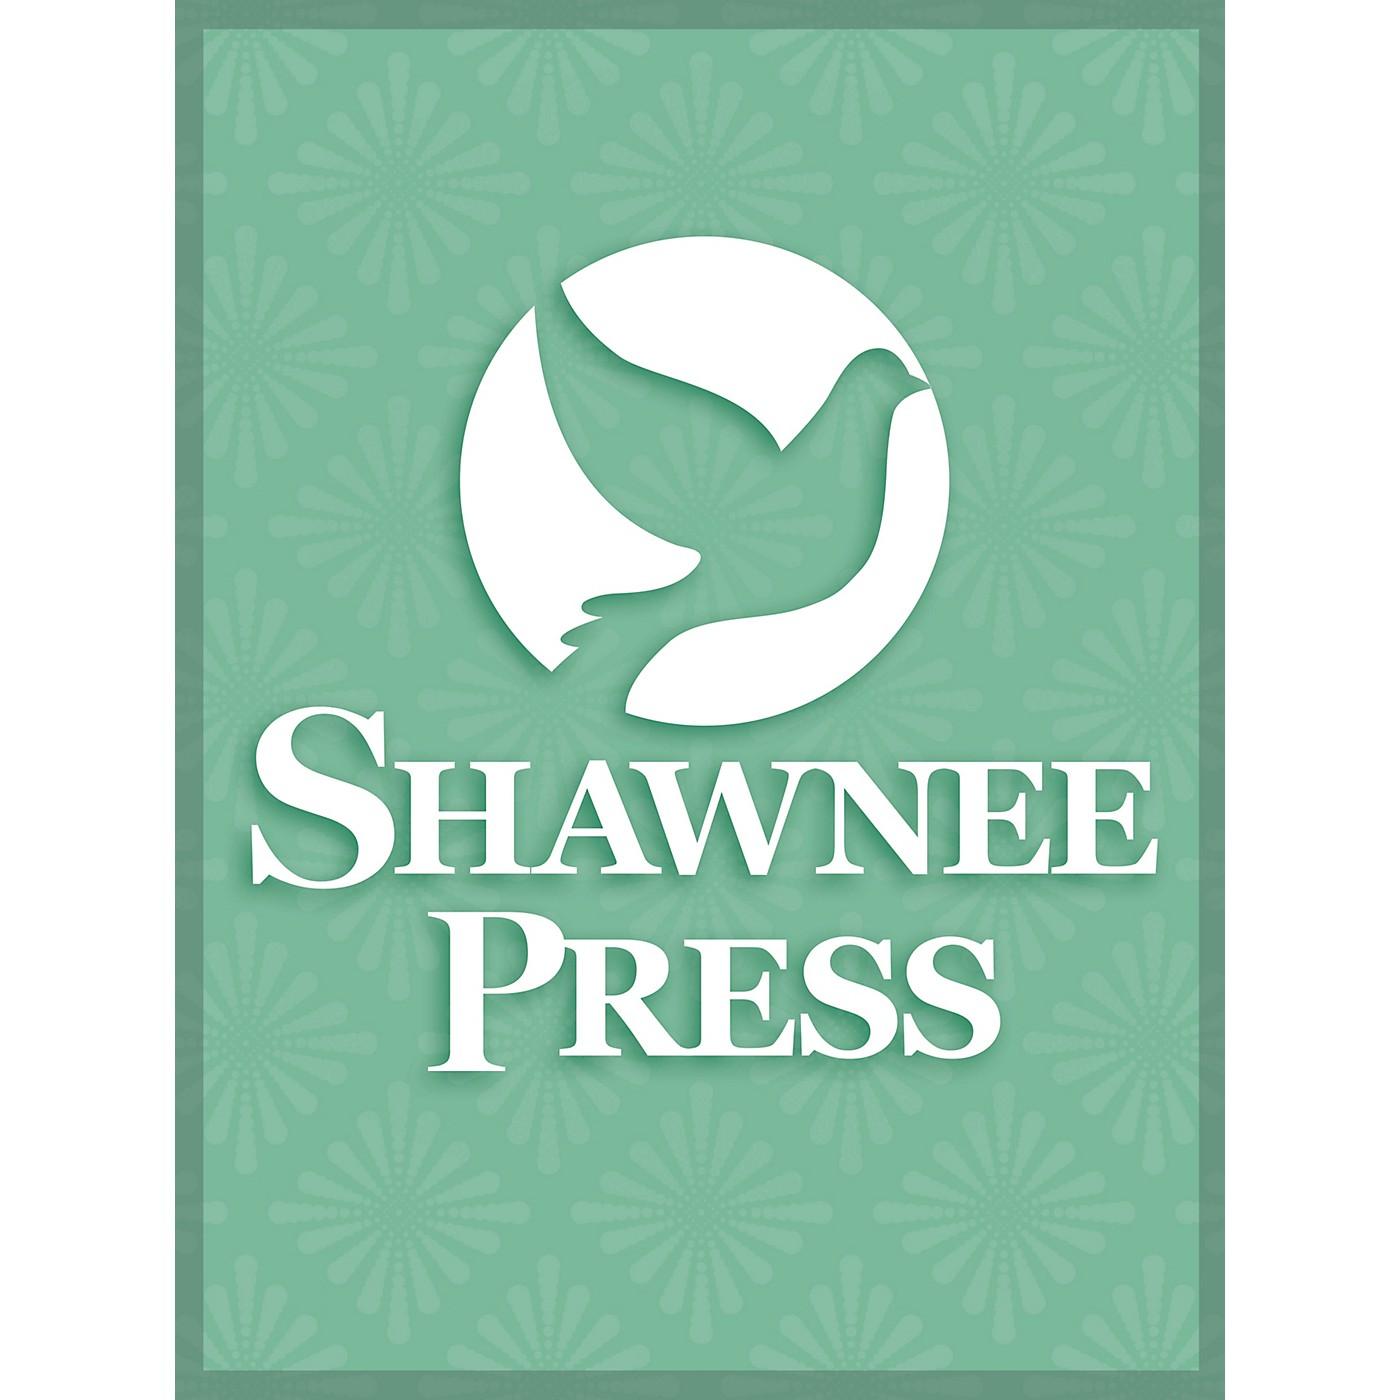 Shawnee Press Carlos Dominguez SATB Arranged by Hawley Ades thumbnail